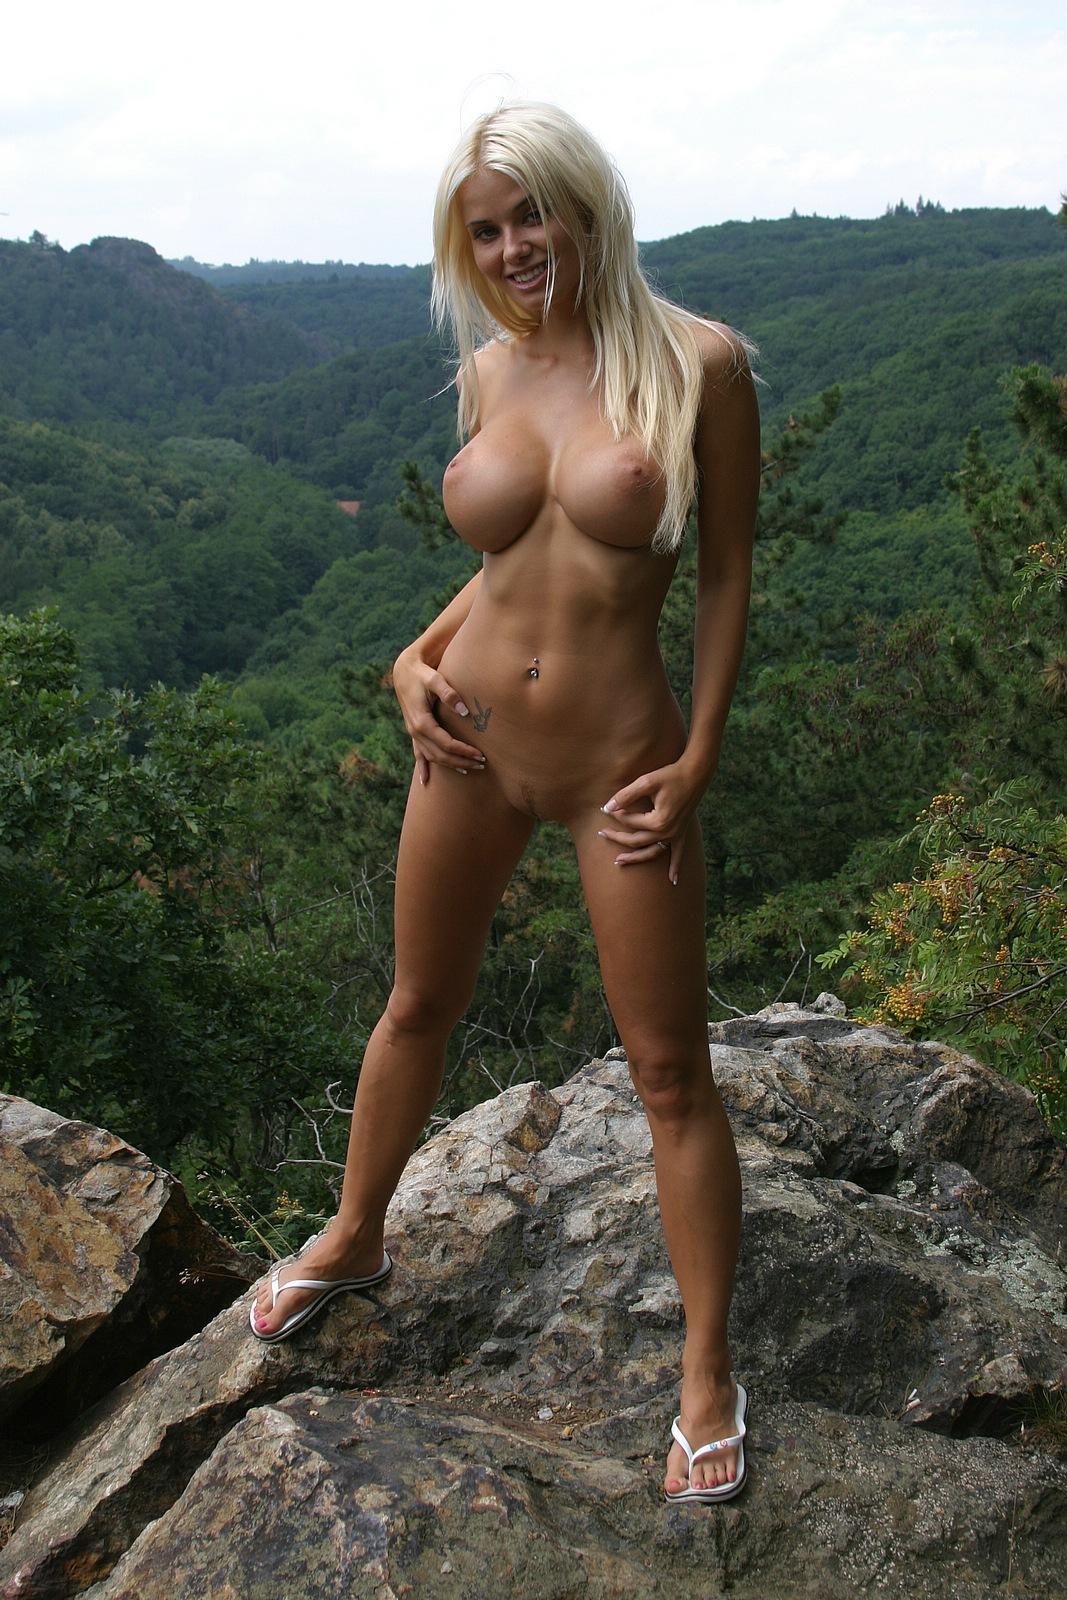 katerina-nude-mountain-lingerie-huge-tits-blonde-21